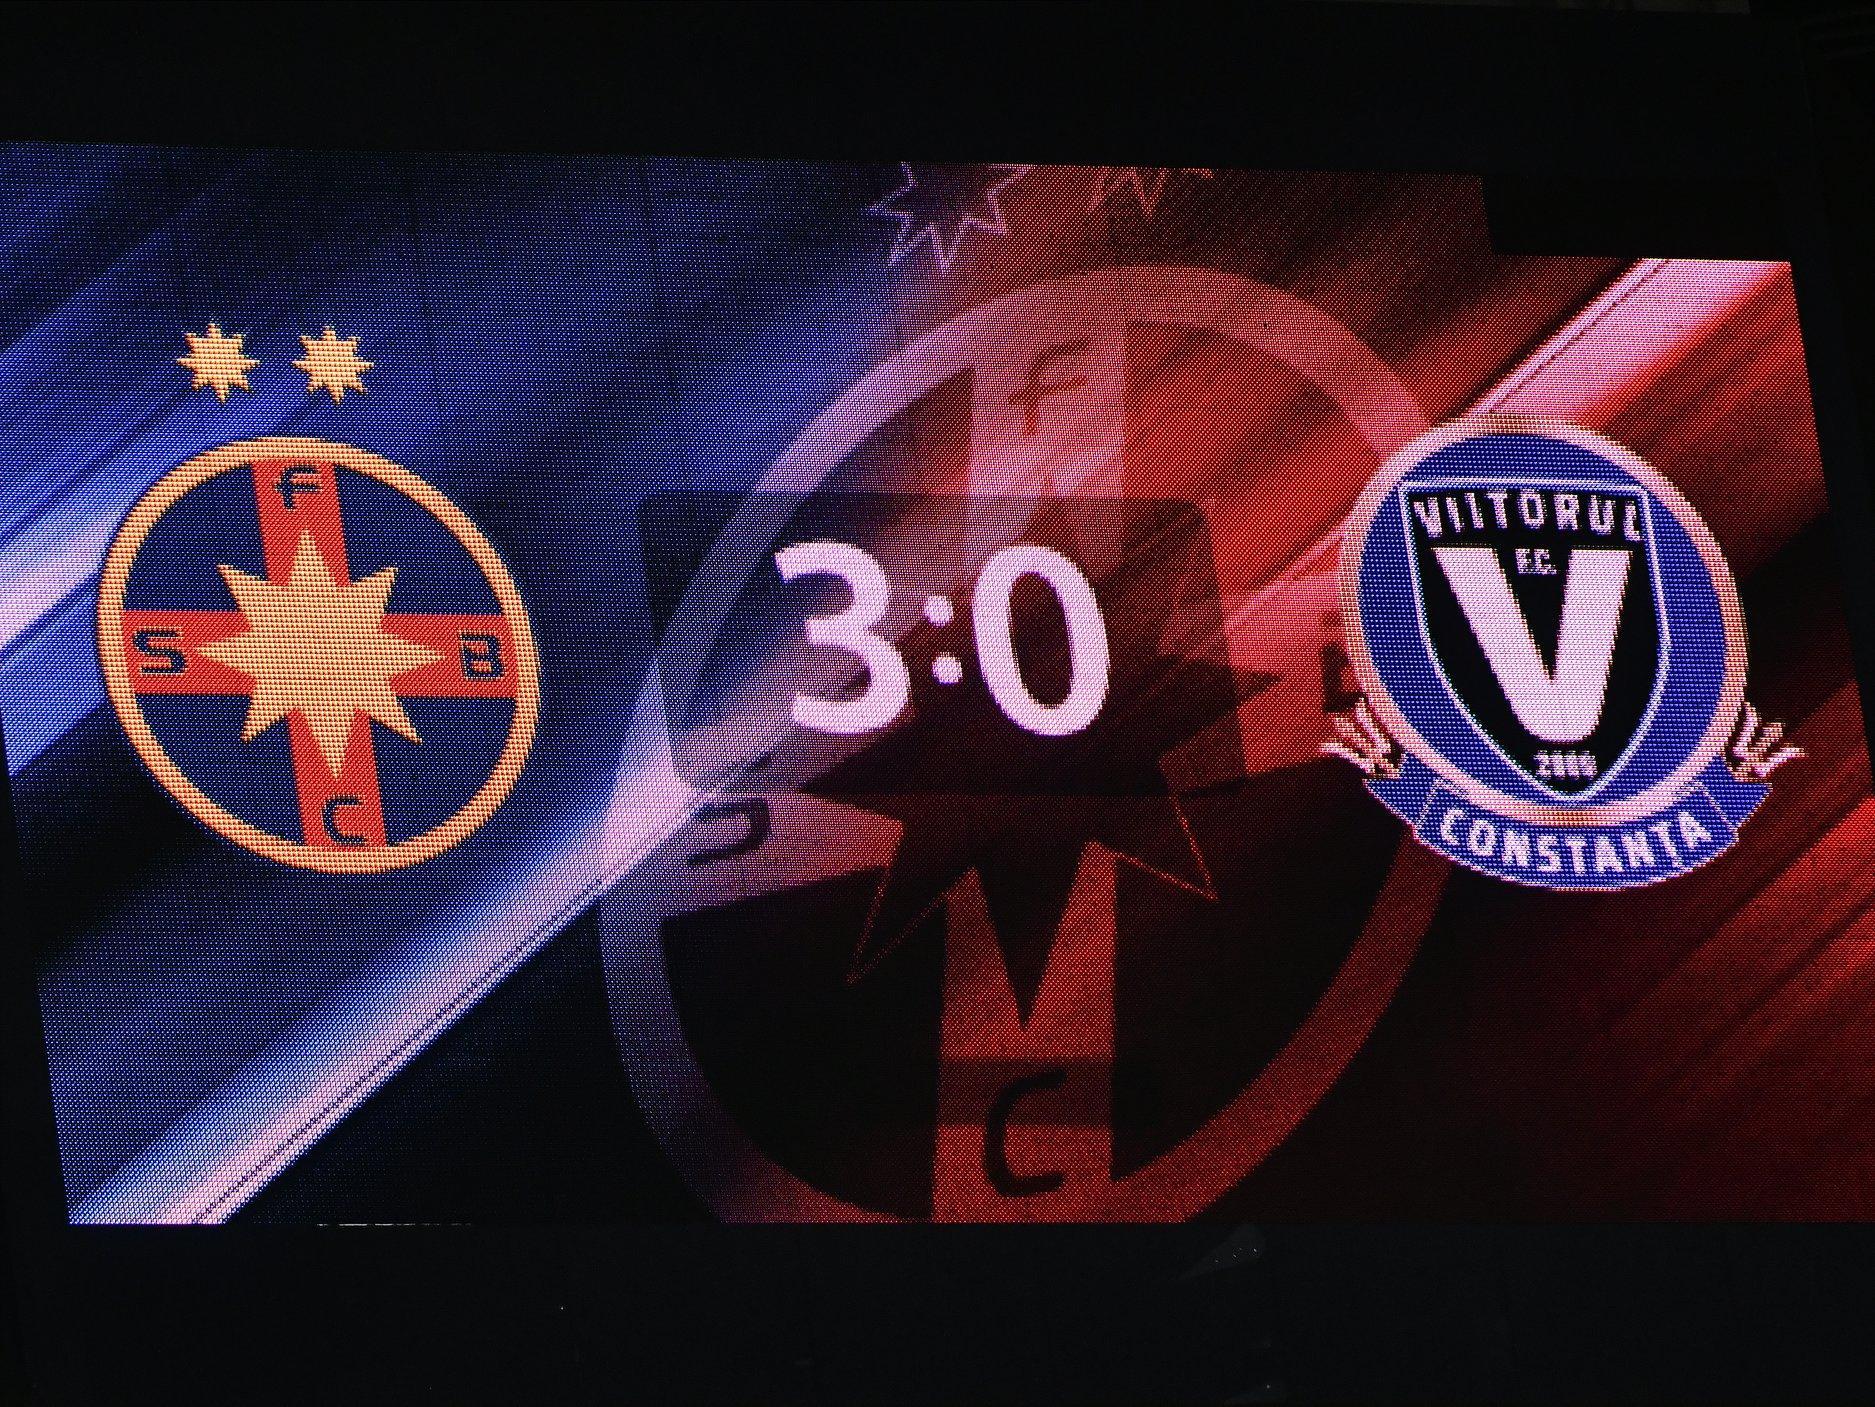 FCSB - VIITORUL 3-0